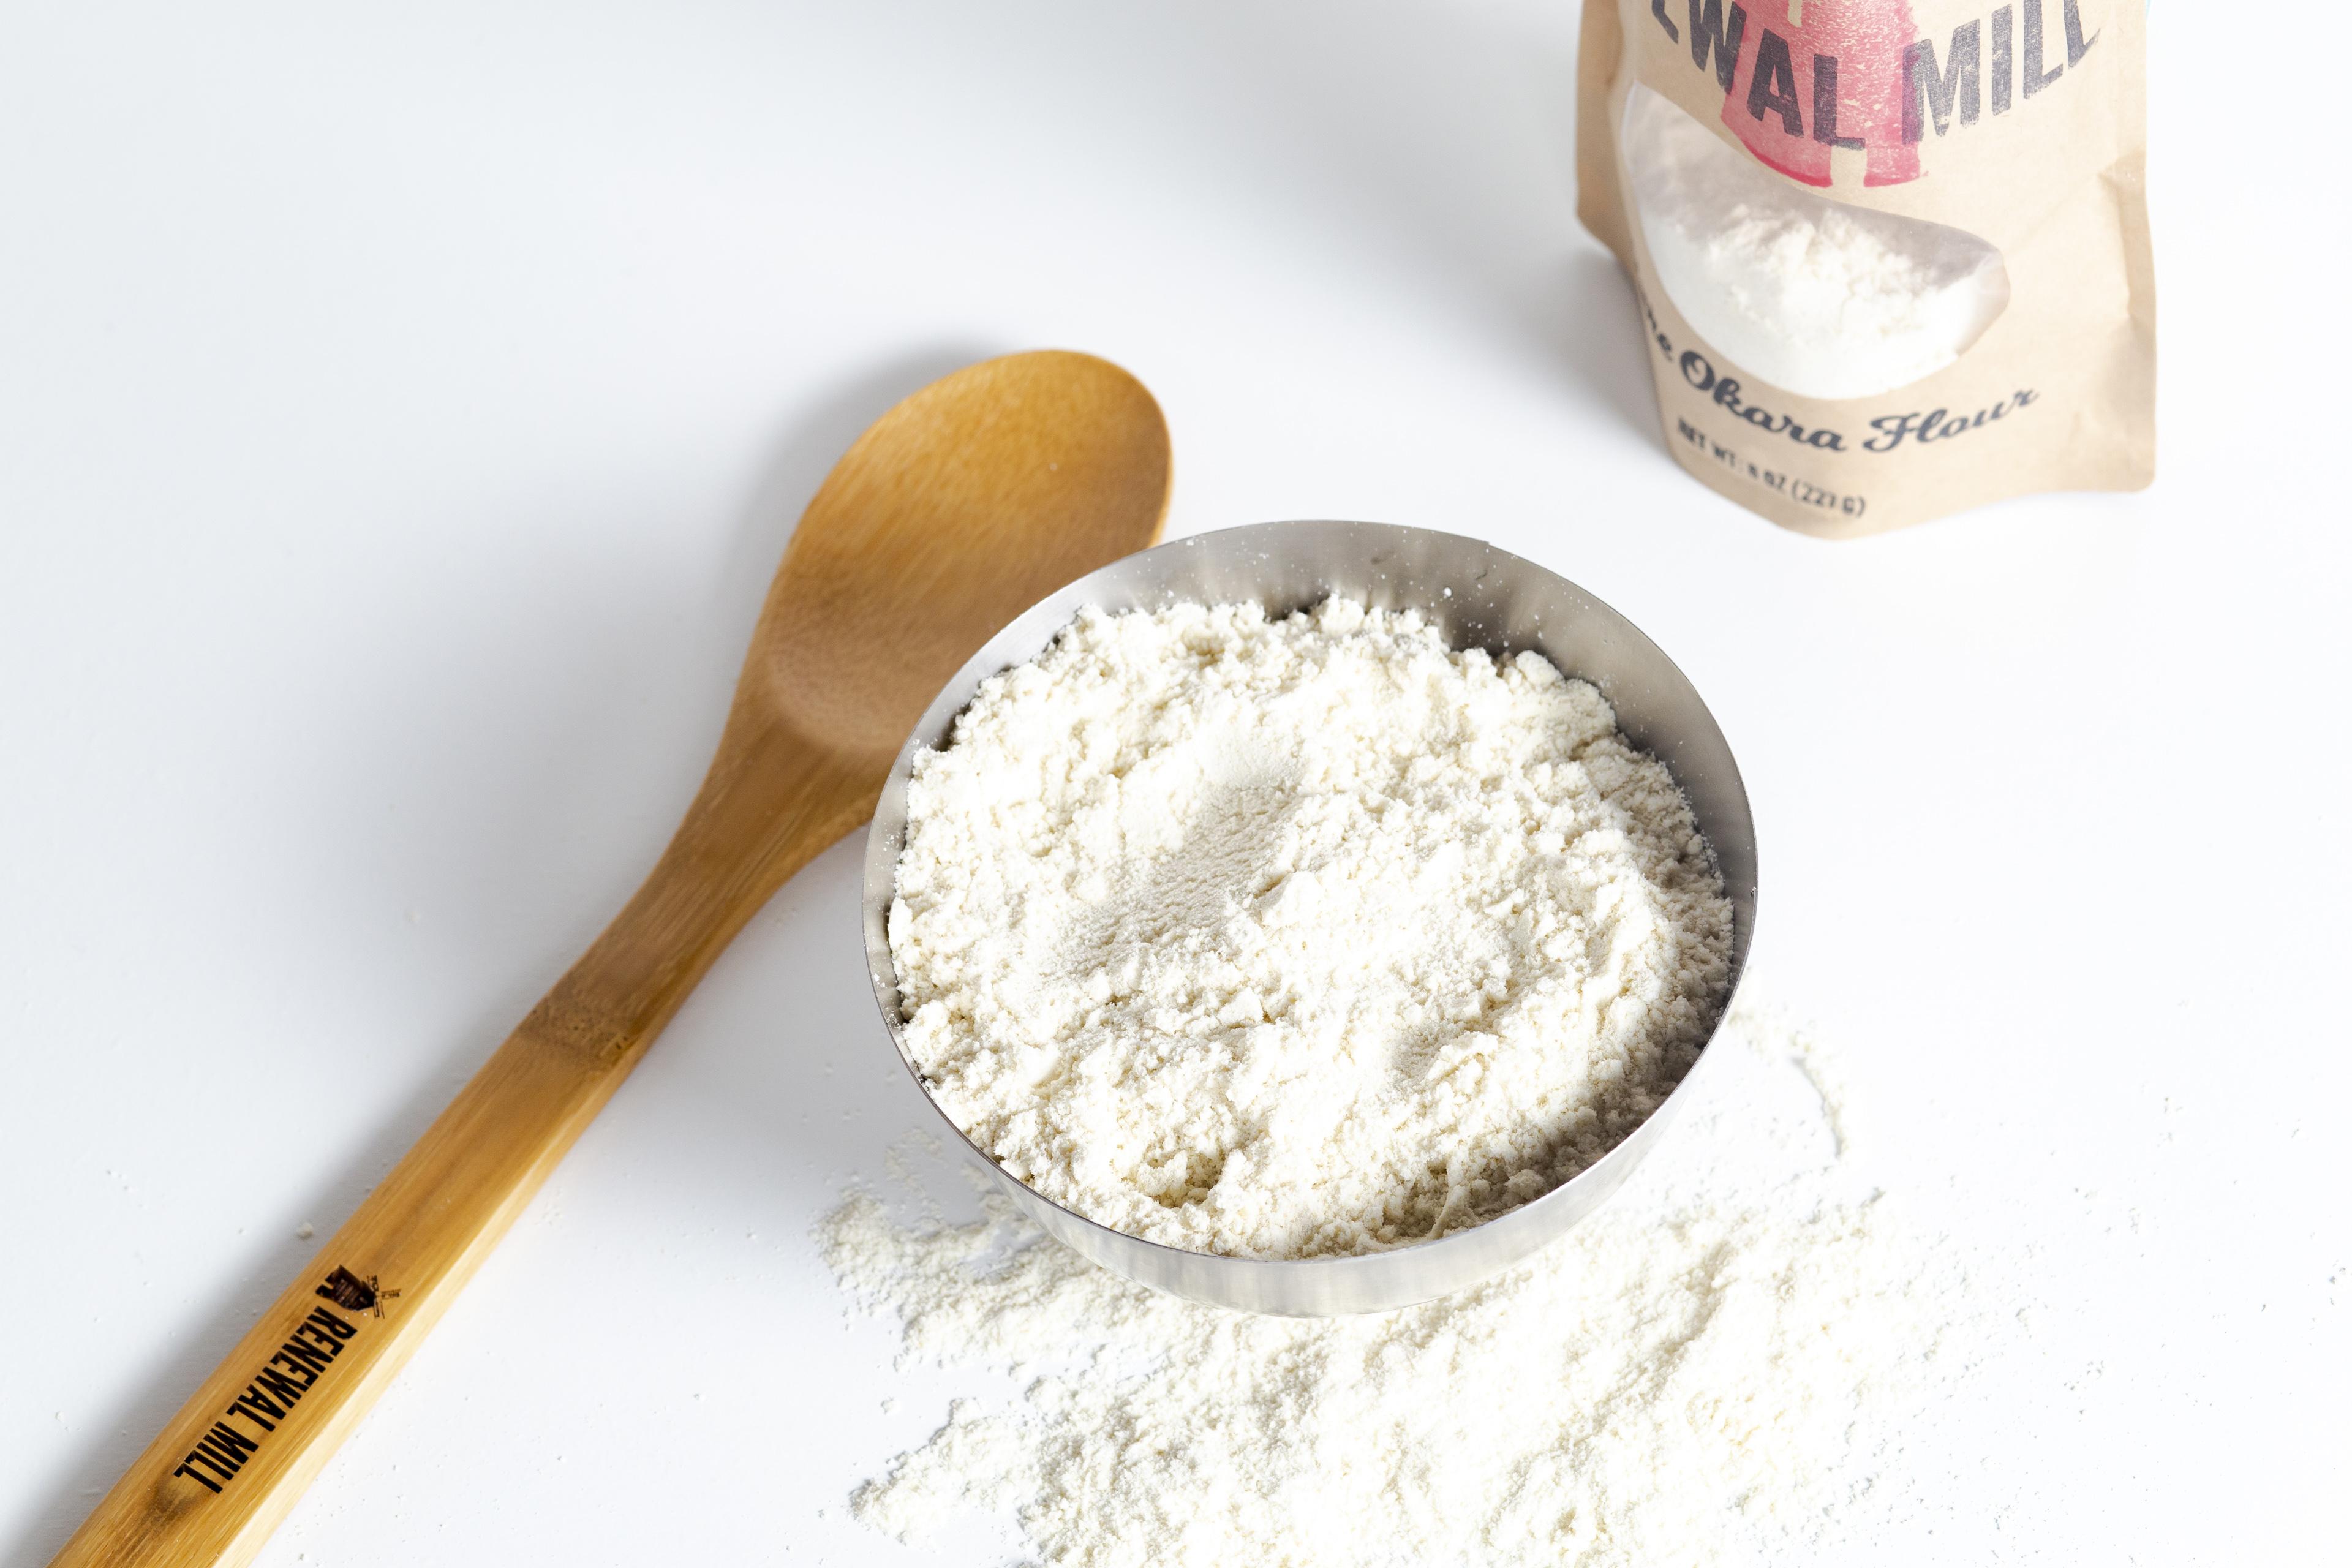 Renewal Mill okara flour